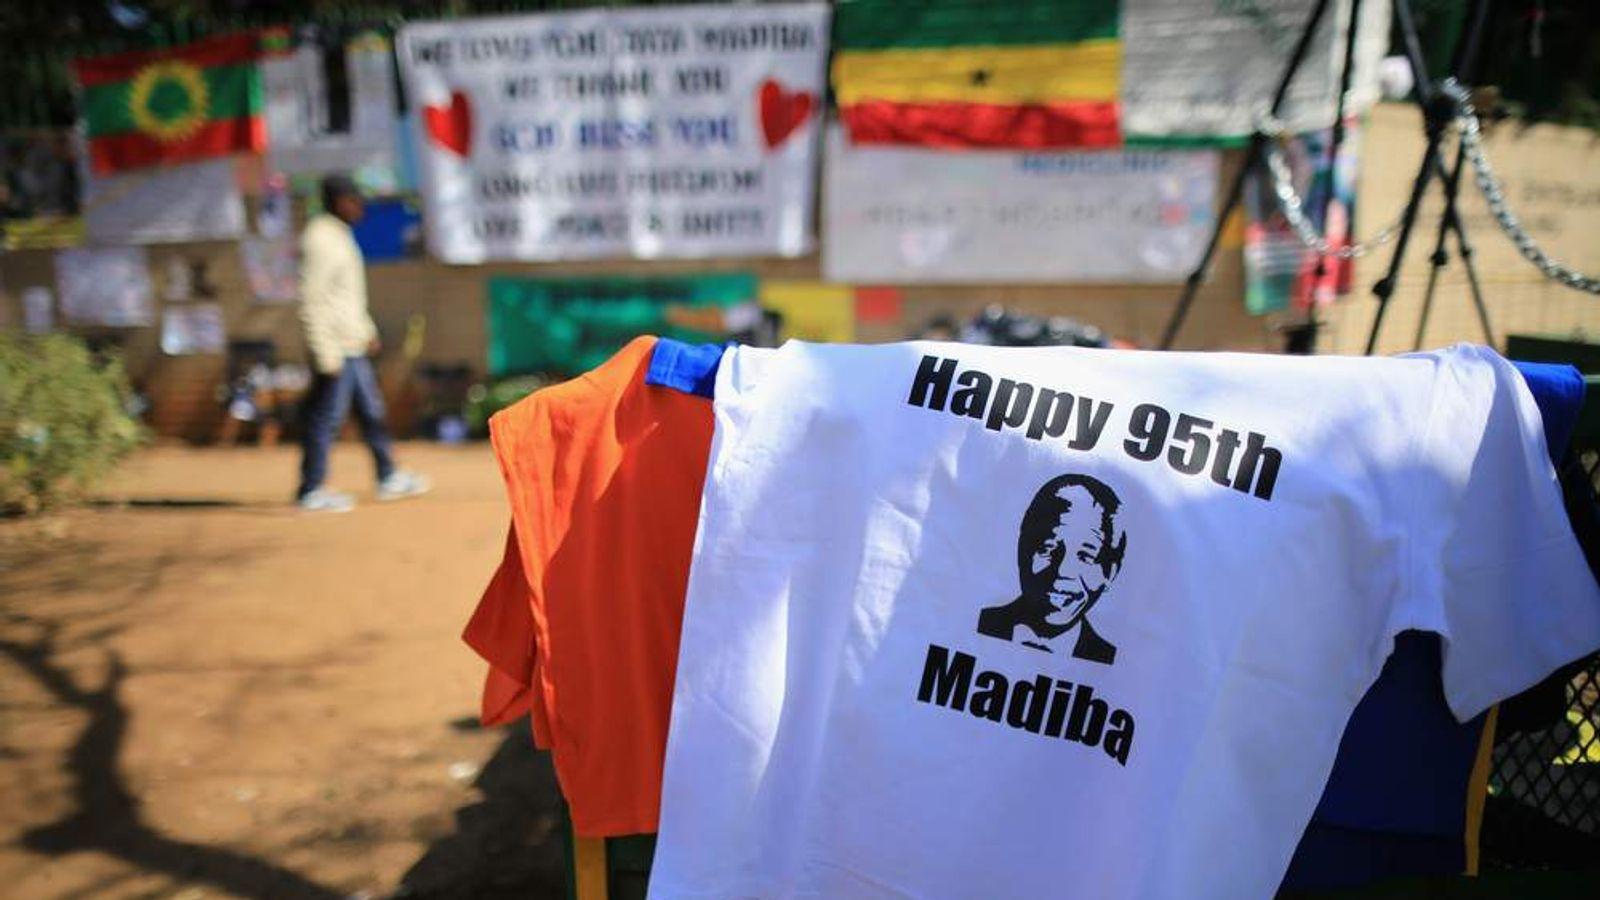 South Africa To Celebrate Nelson Mandela's Birthday